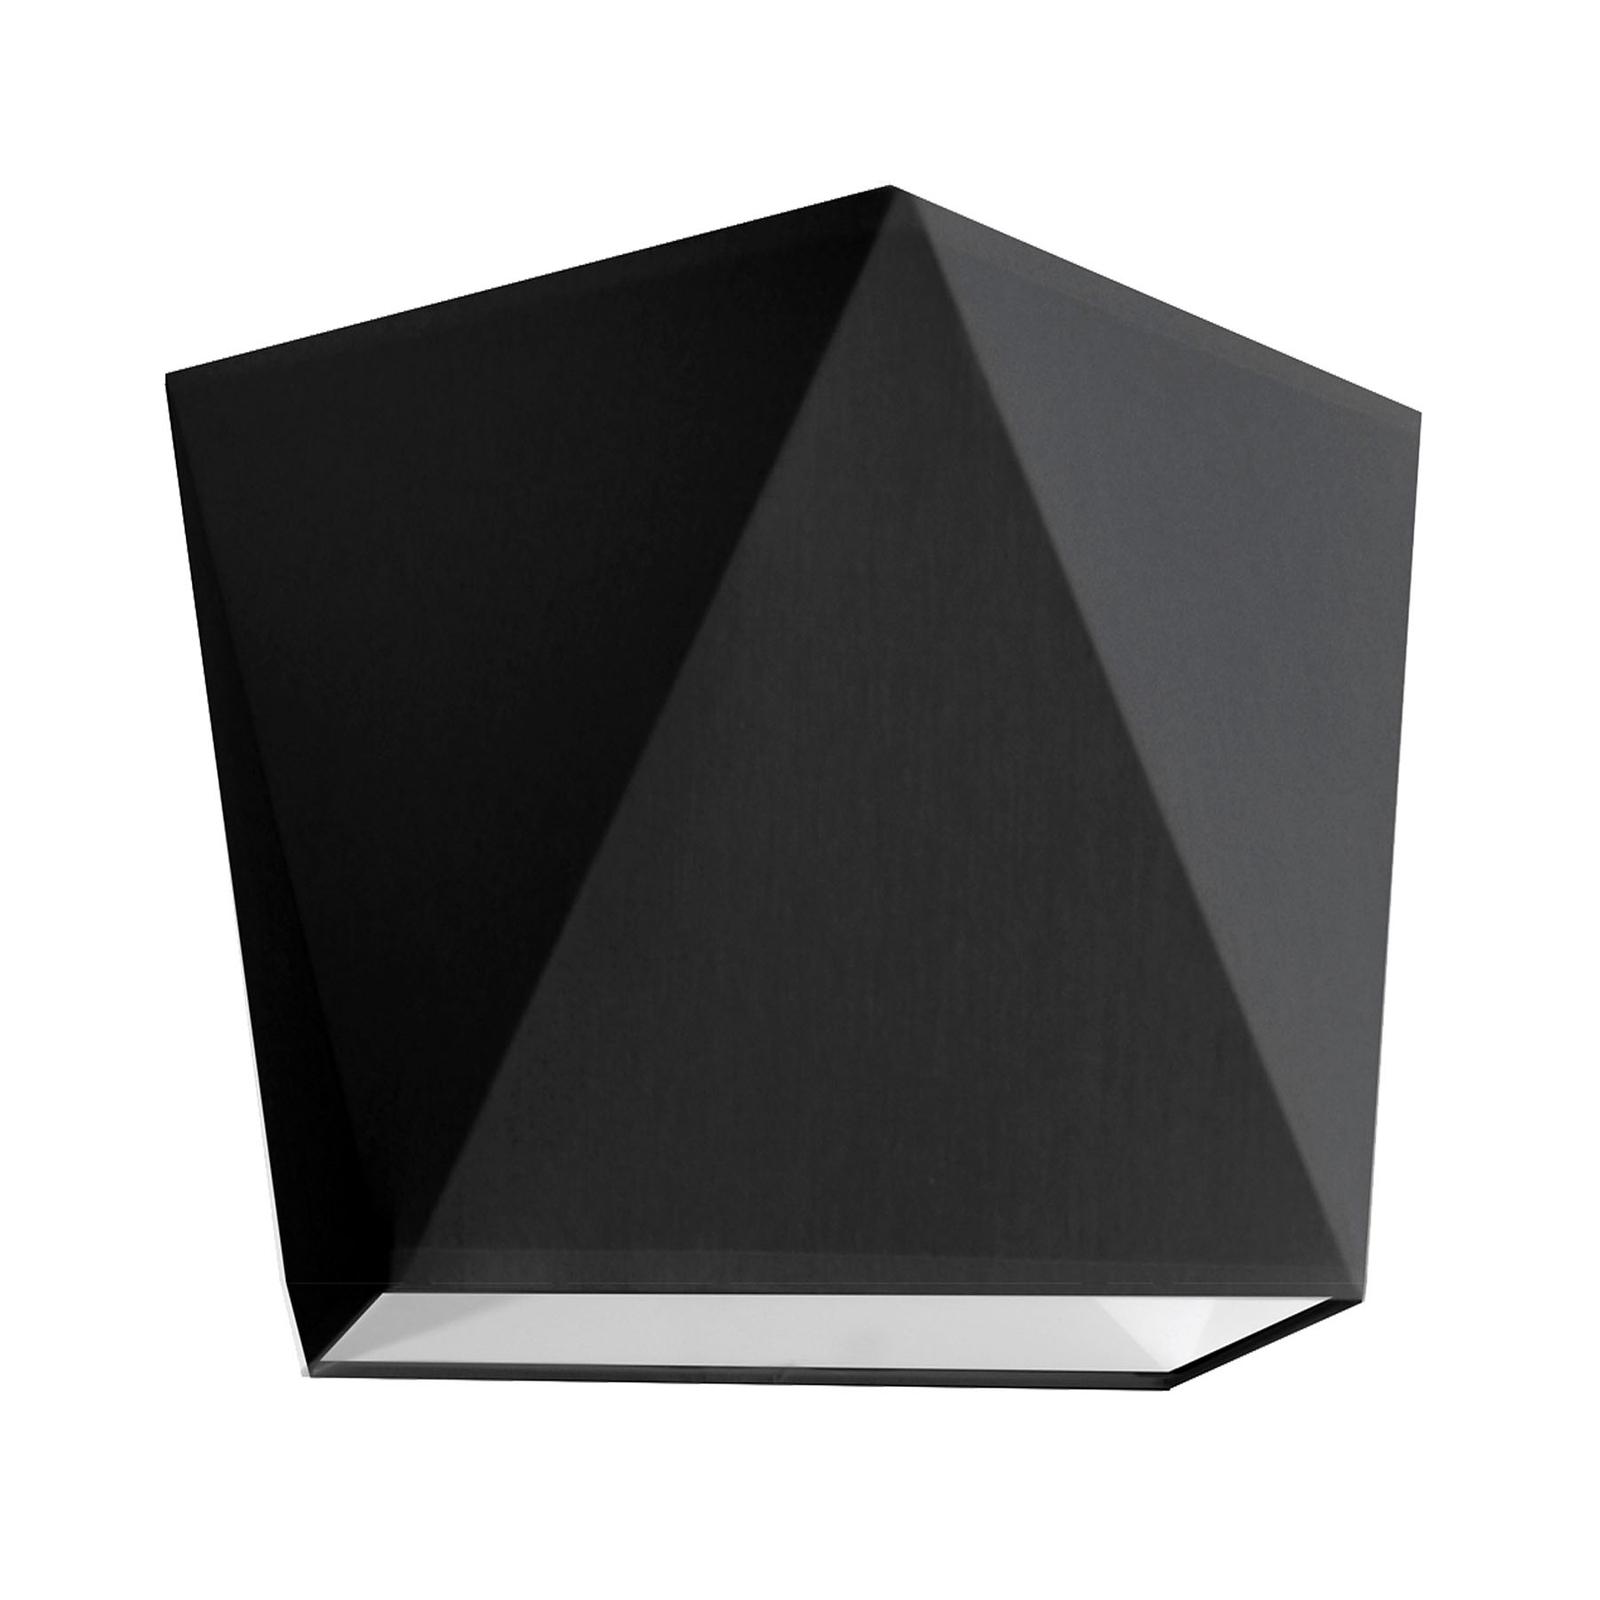 Lampenschirm Karo, E27, 16 x 16 cm, schwarz